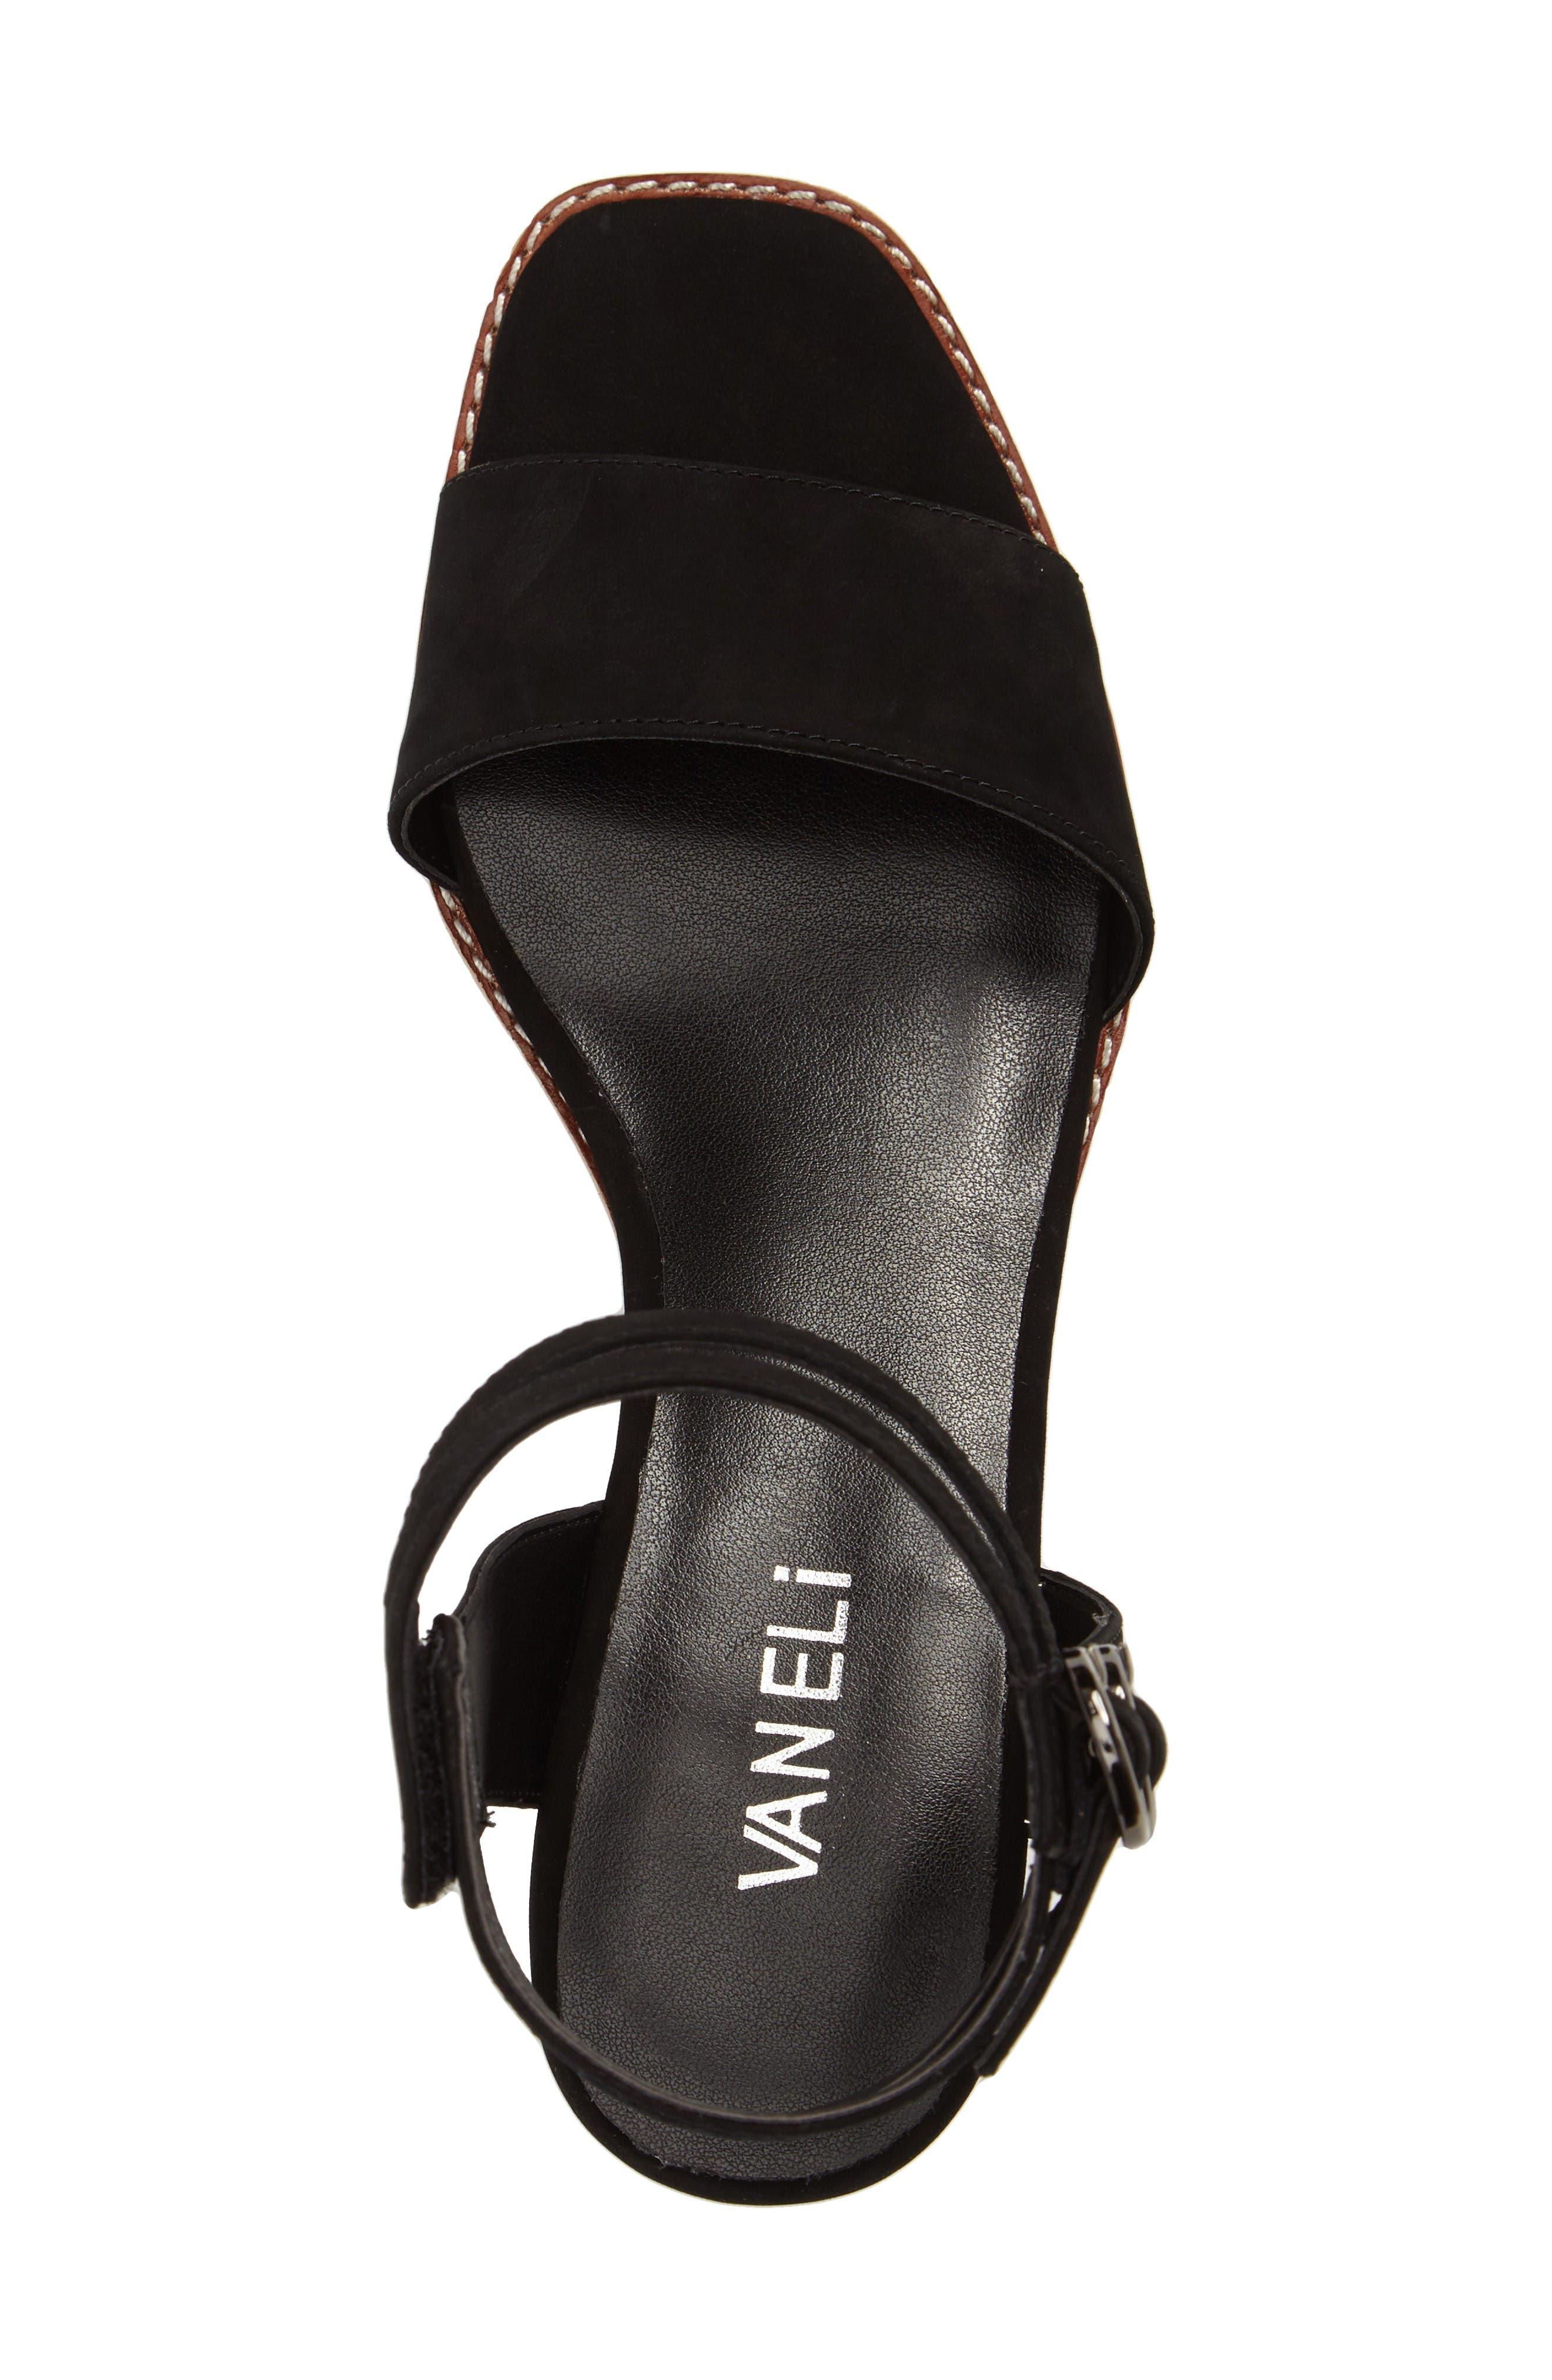 Jarita Ankle Strap Sandal,                             Alternate thumbnail 5, color,                             Black Leather